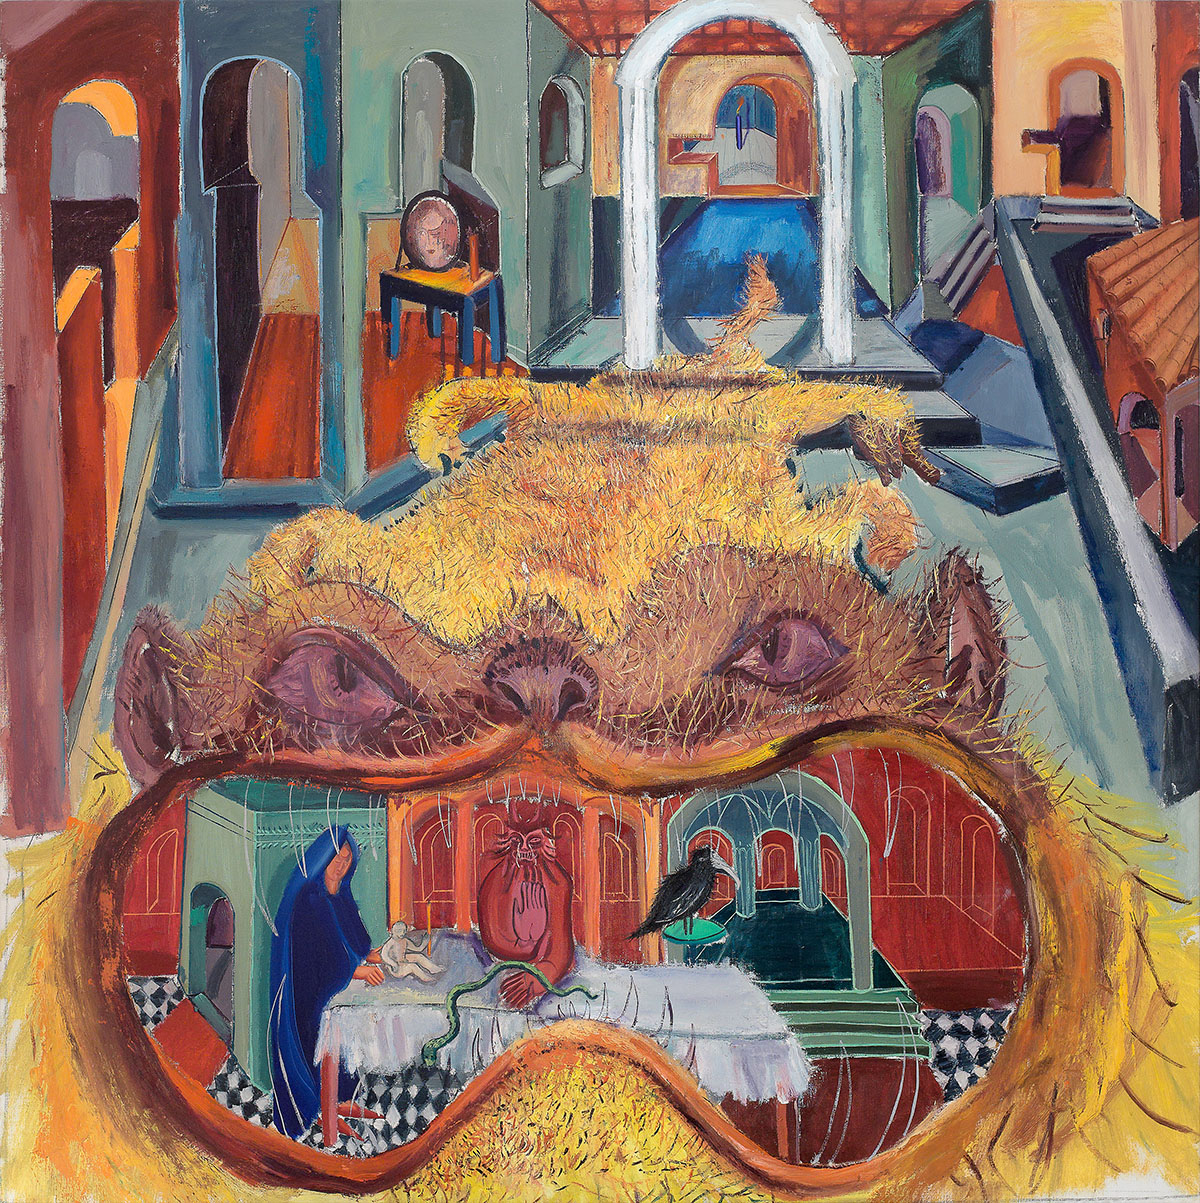 Tincuta Marin, The Monster, 189x190cm, oil on canvas, 2021